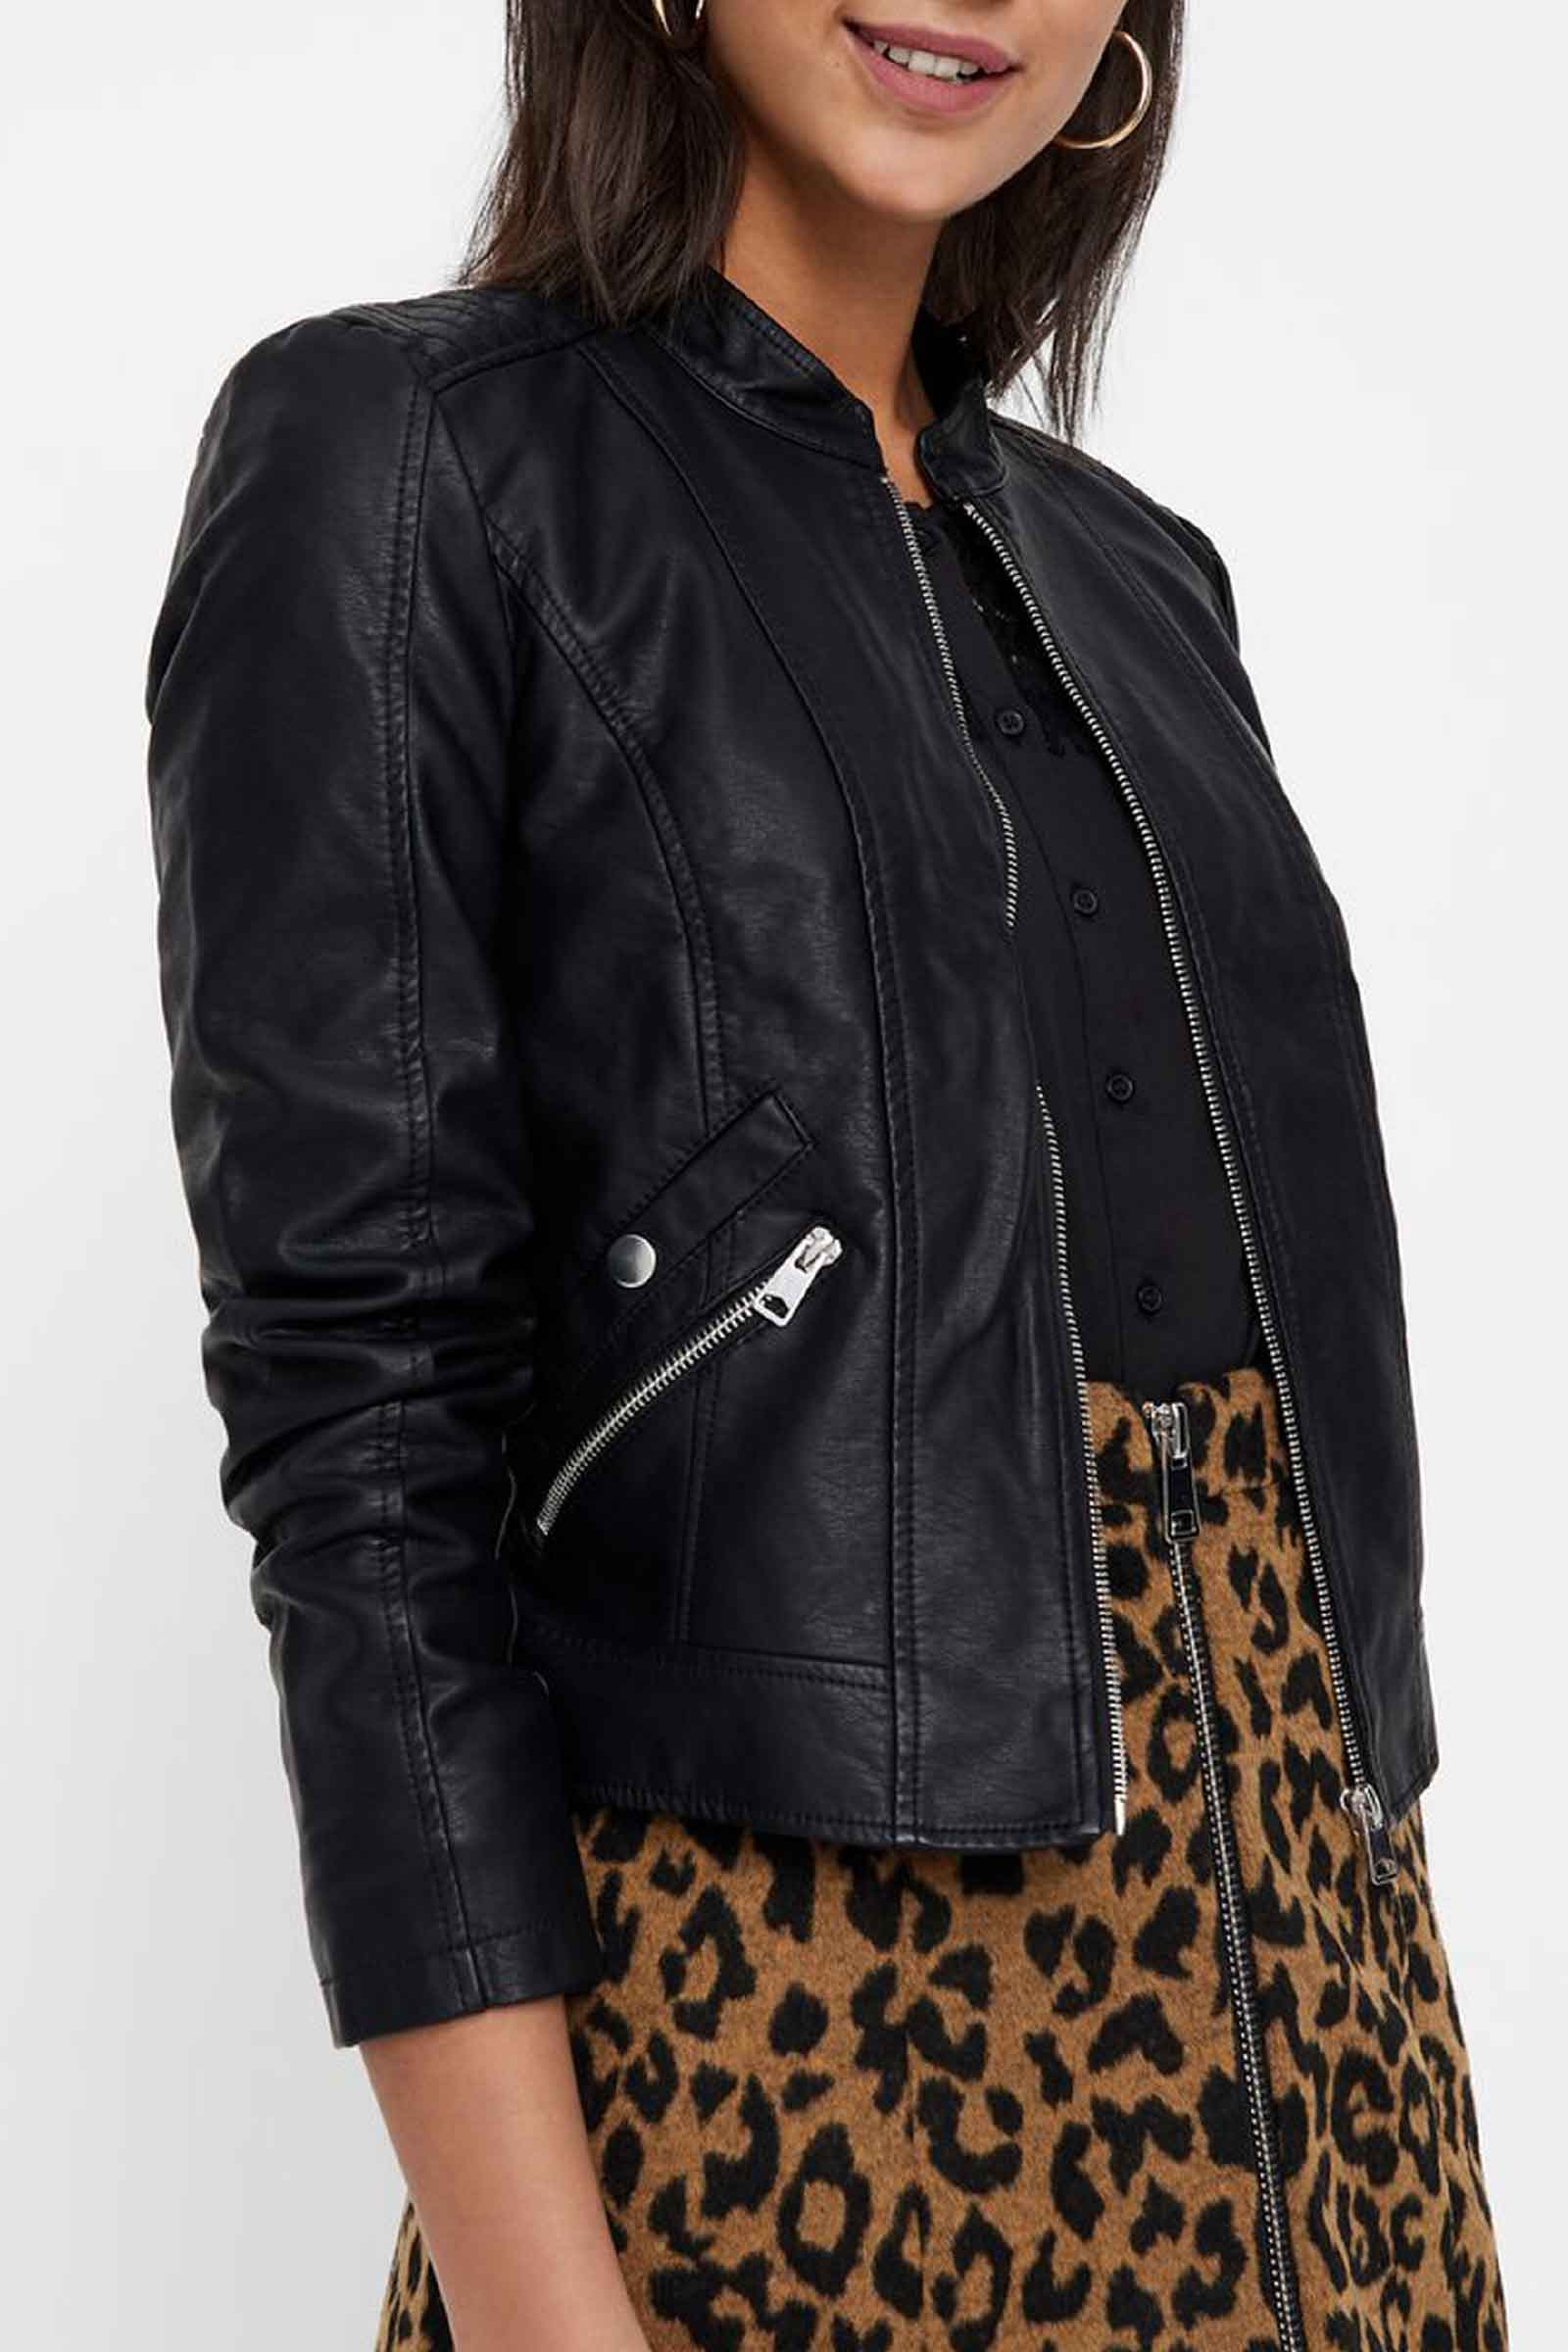 Women's Black Jacket VERO MODA | Jacket | 10212316Black